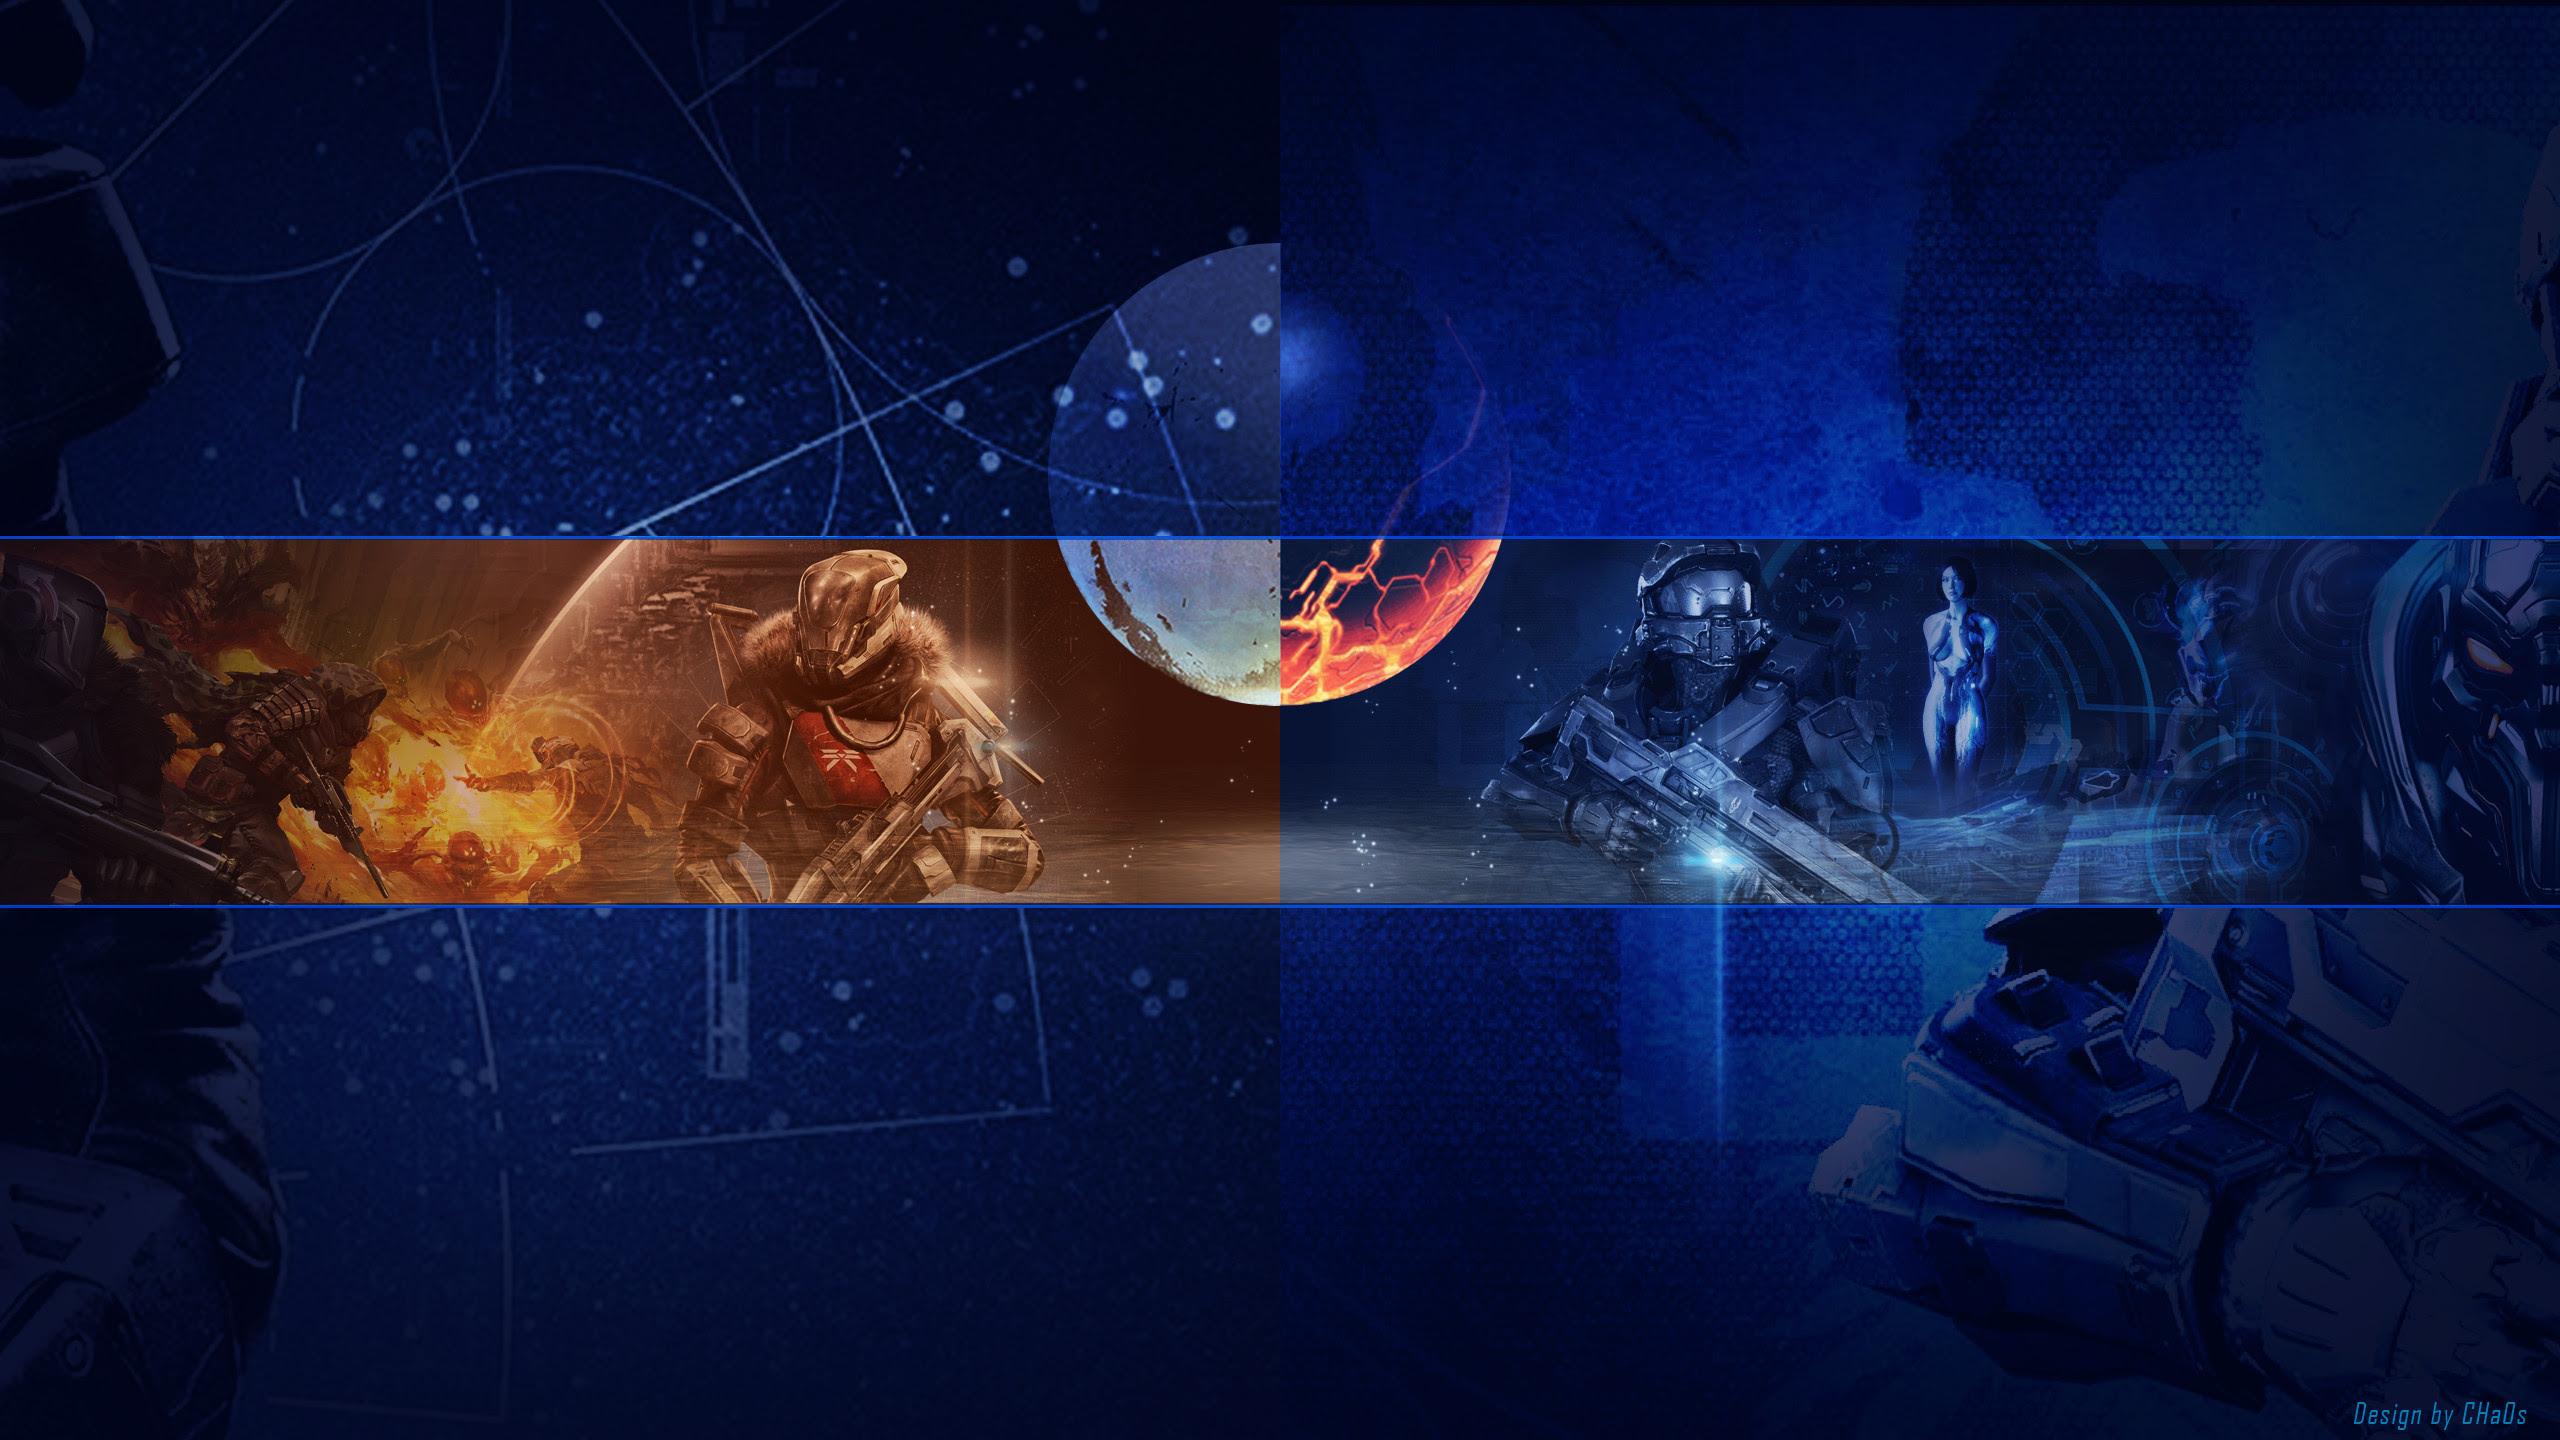 Download 88 Koleksi Background Untuk Banner Yt Gratis